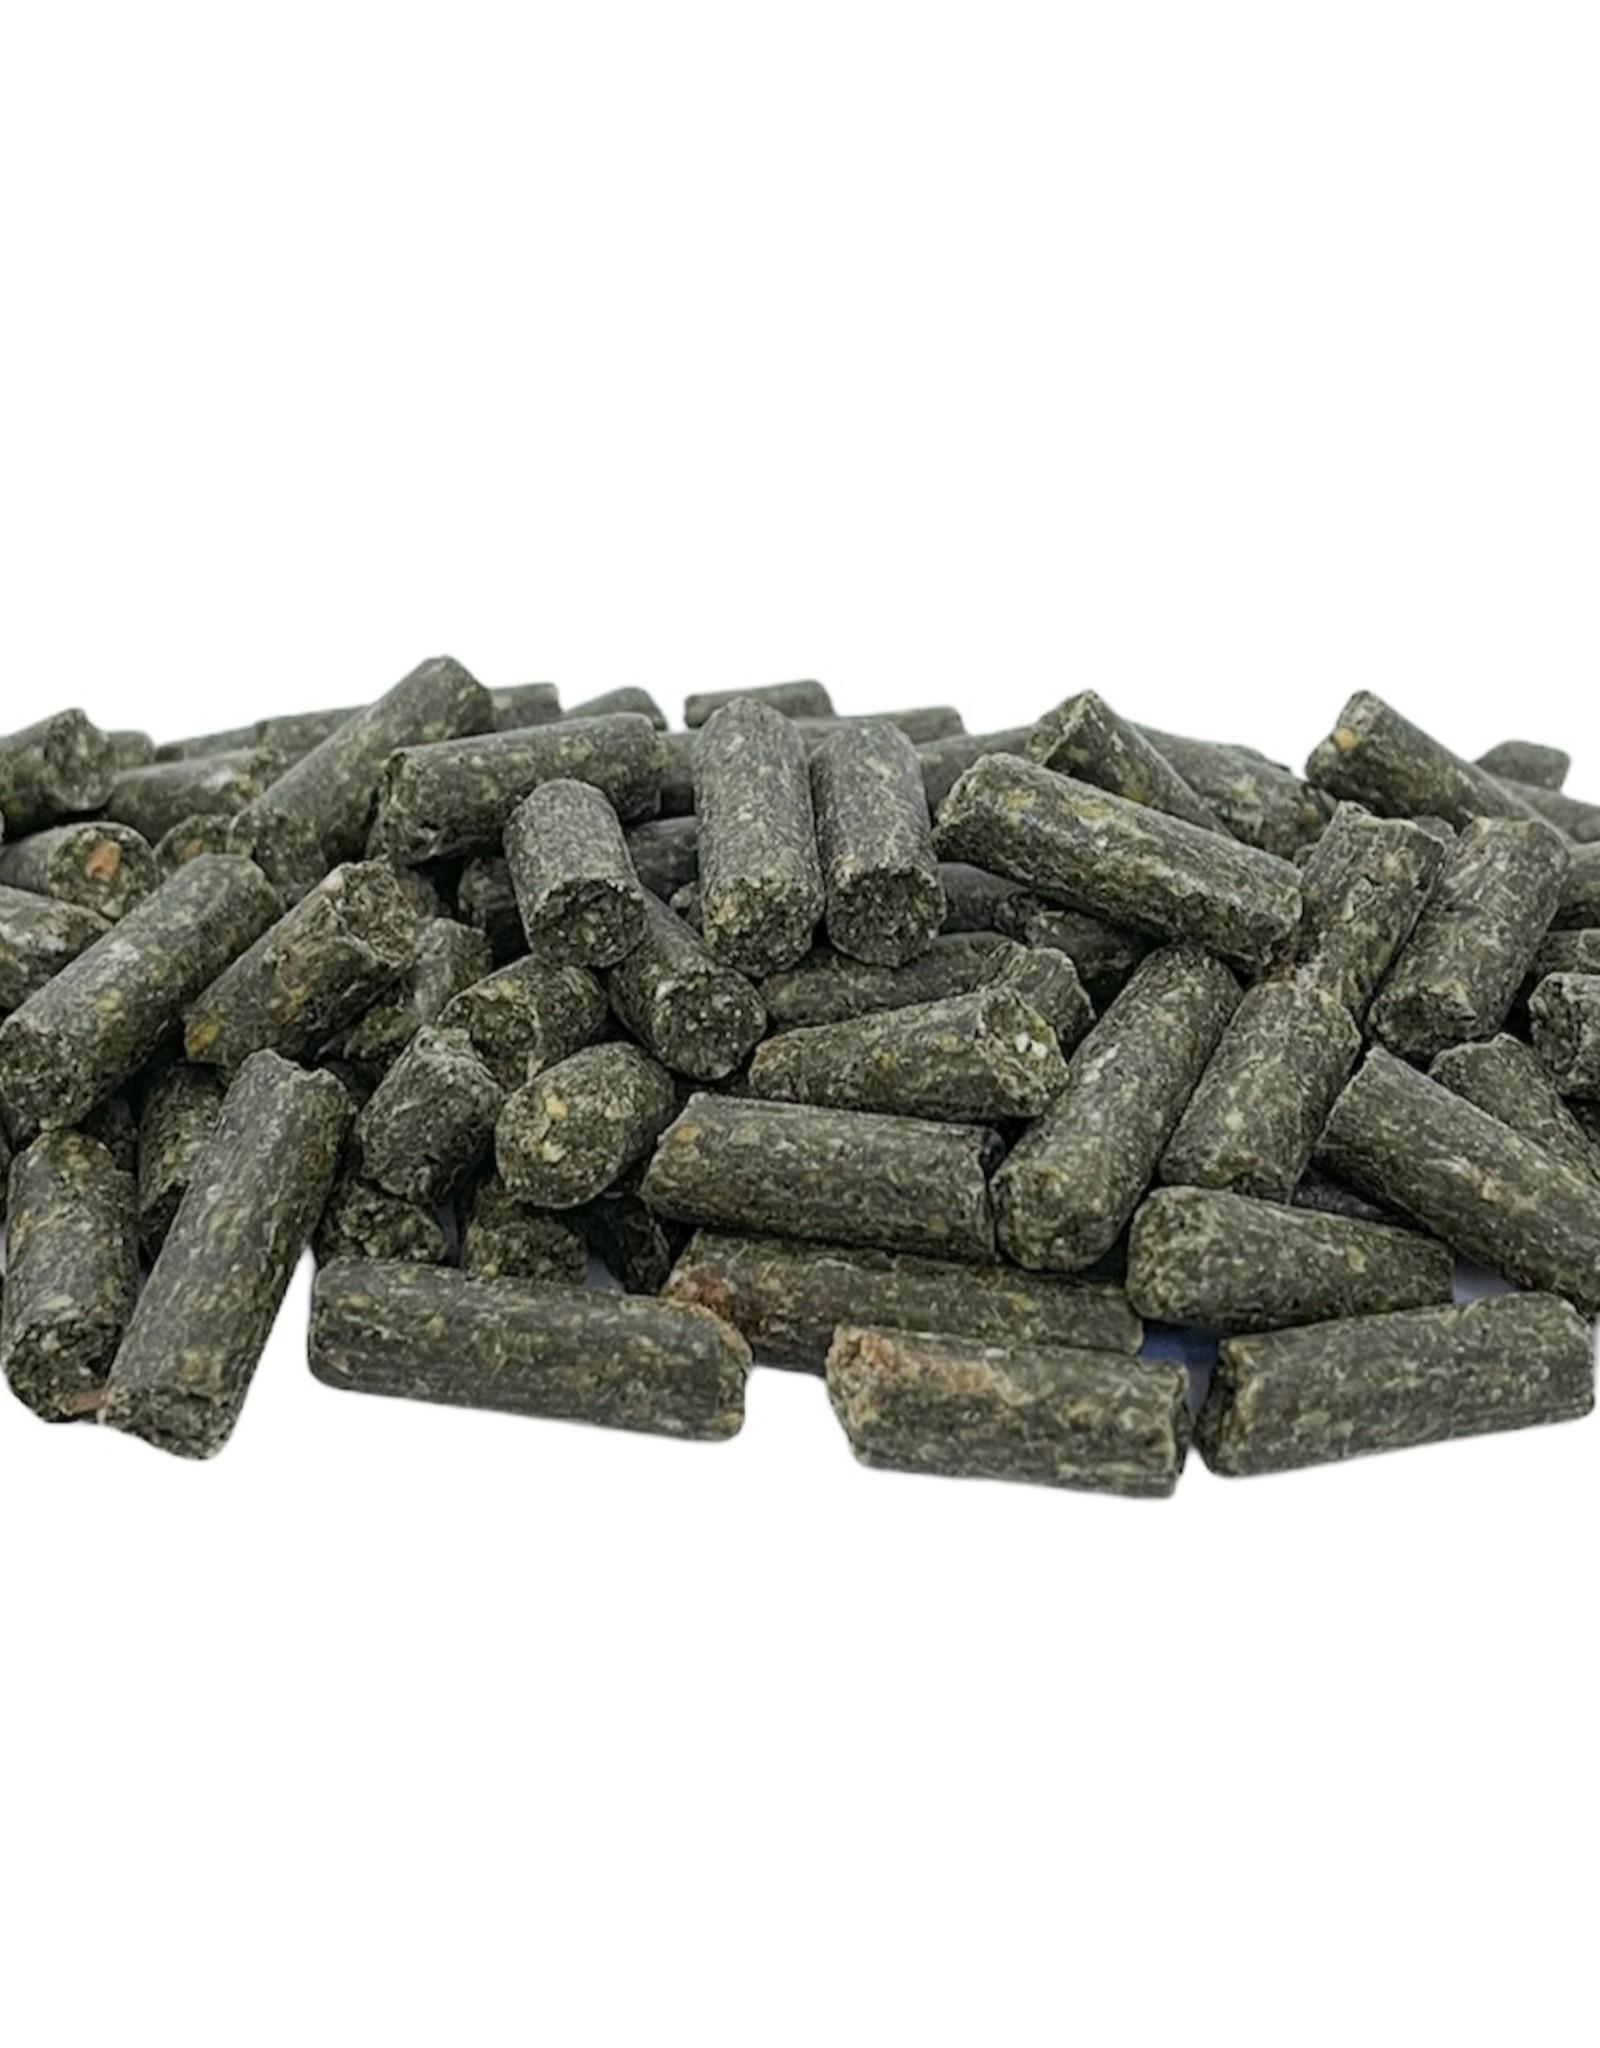 Baitworld Baitworld Babycorn Green Lipped Mussel Pellets 2kg